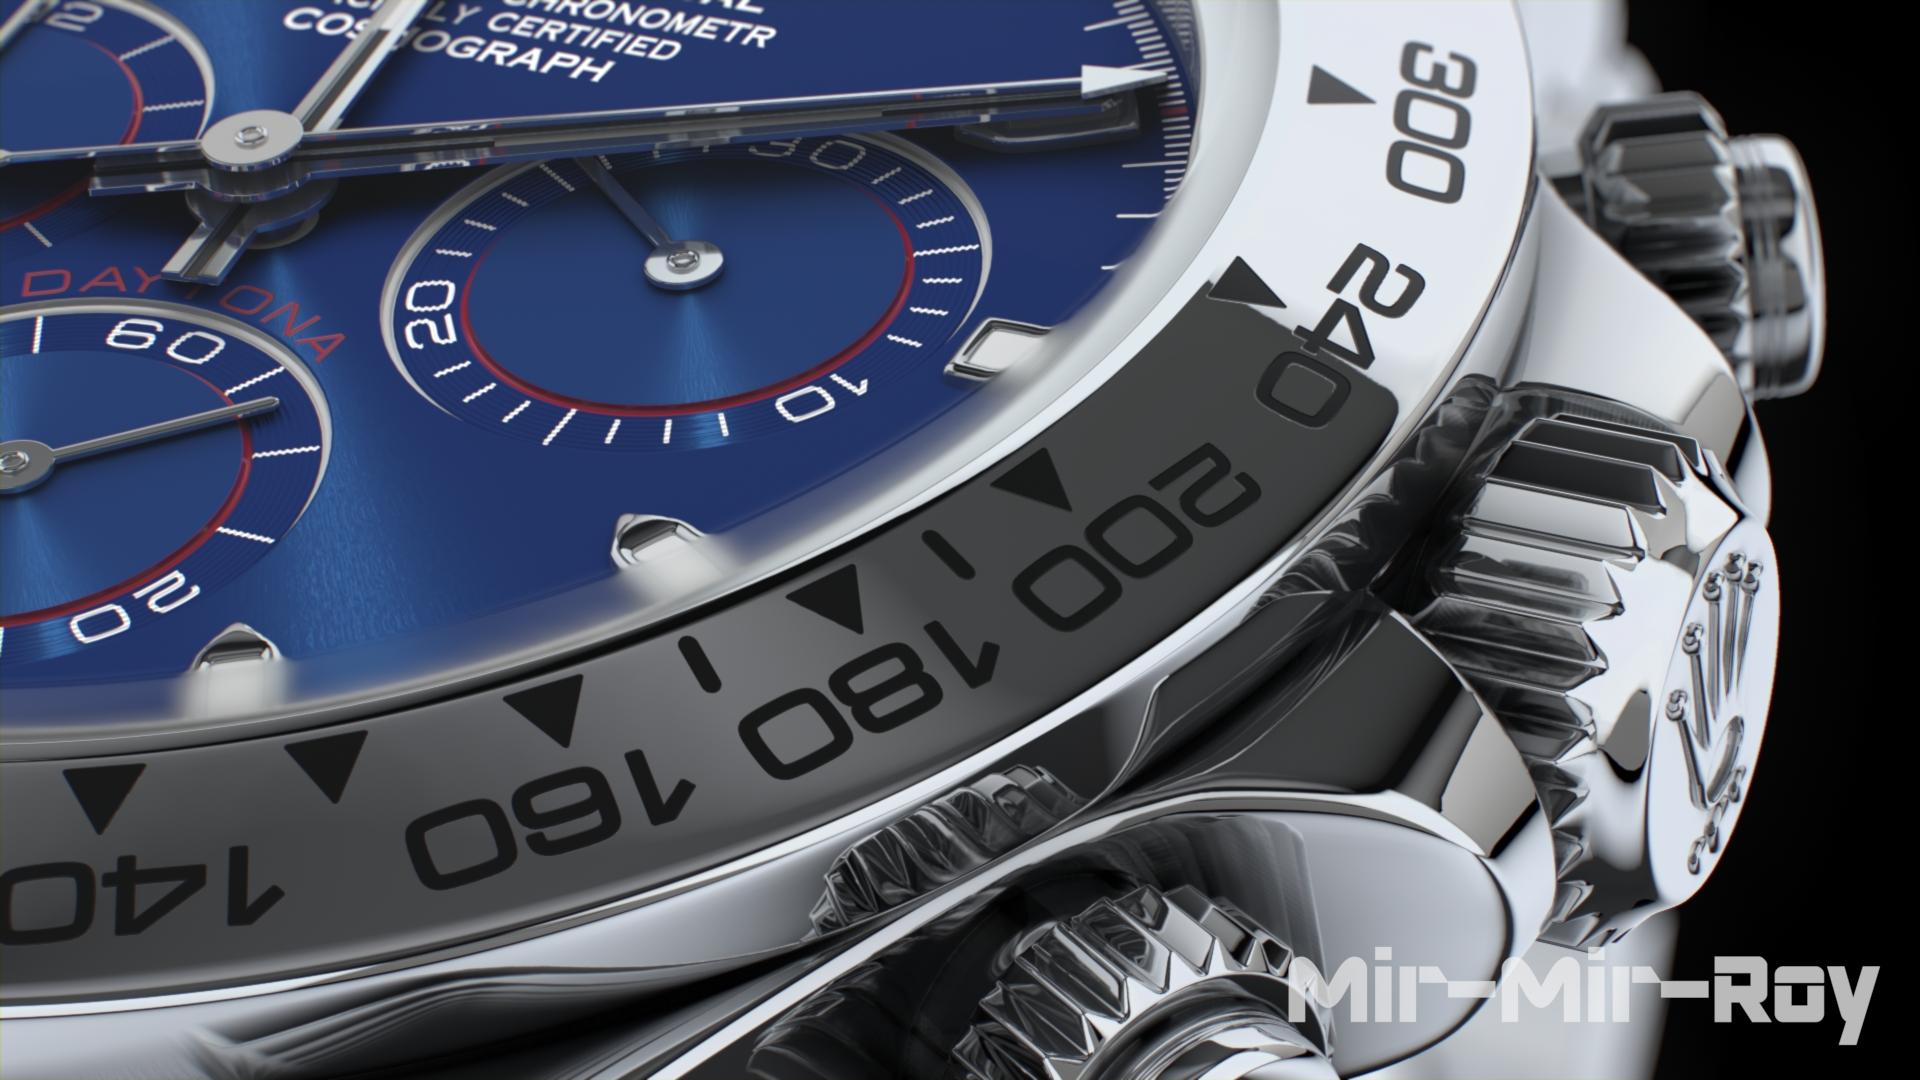 EEVEE Test: Rolex Cosmograph Daytona Watch - BlenderNation